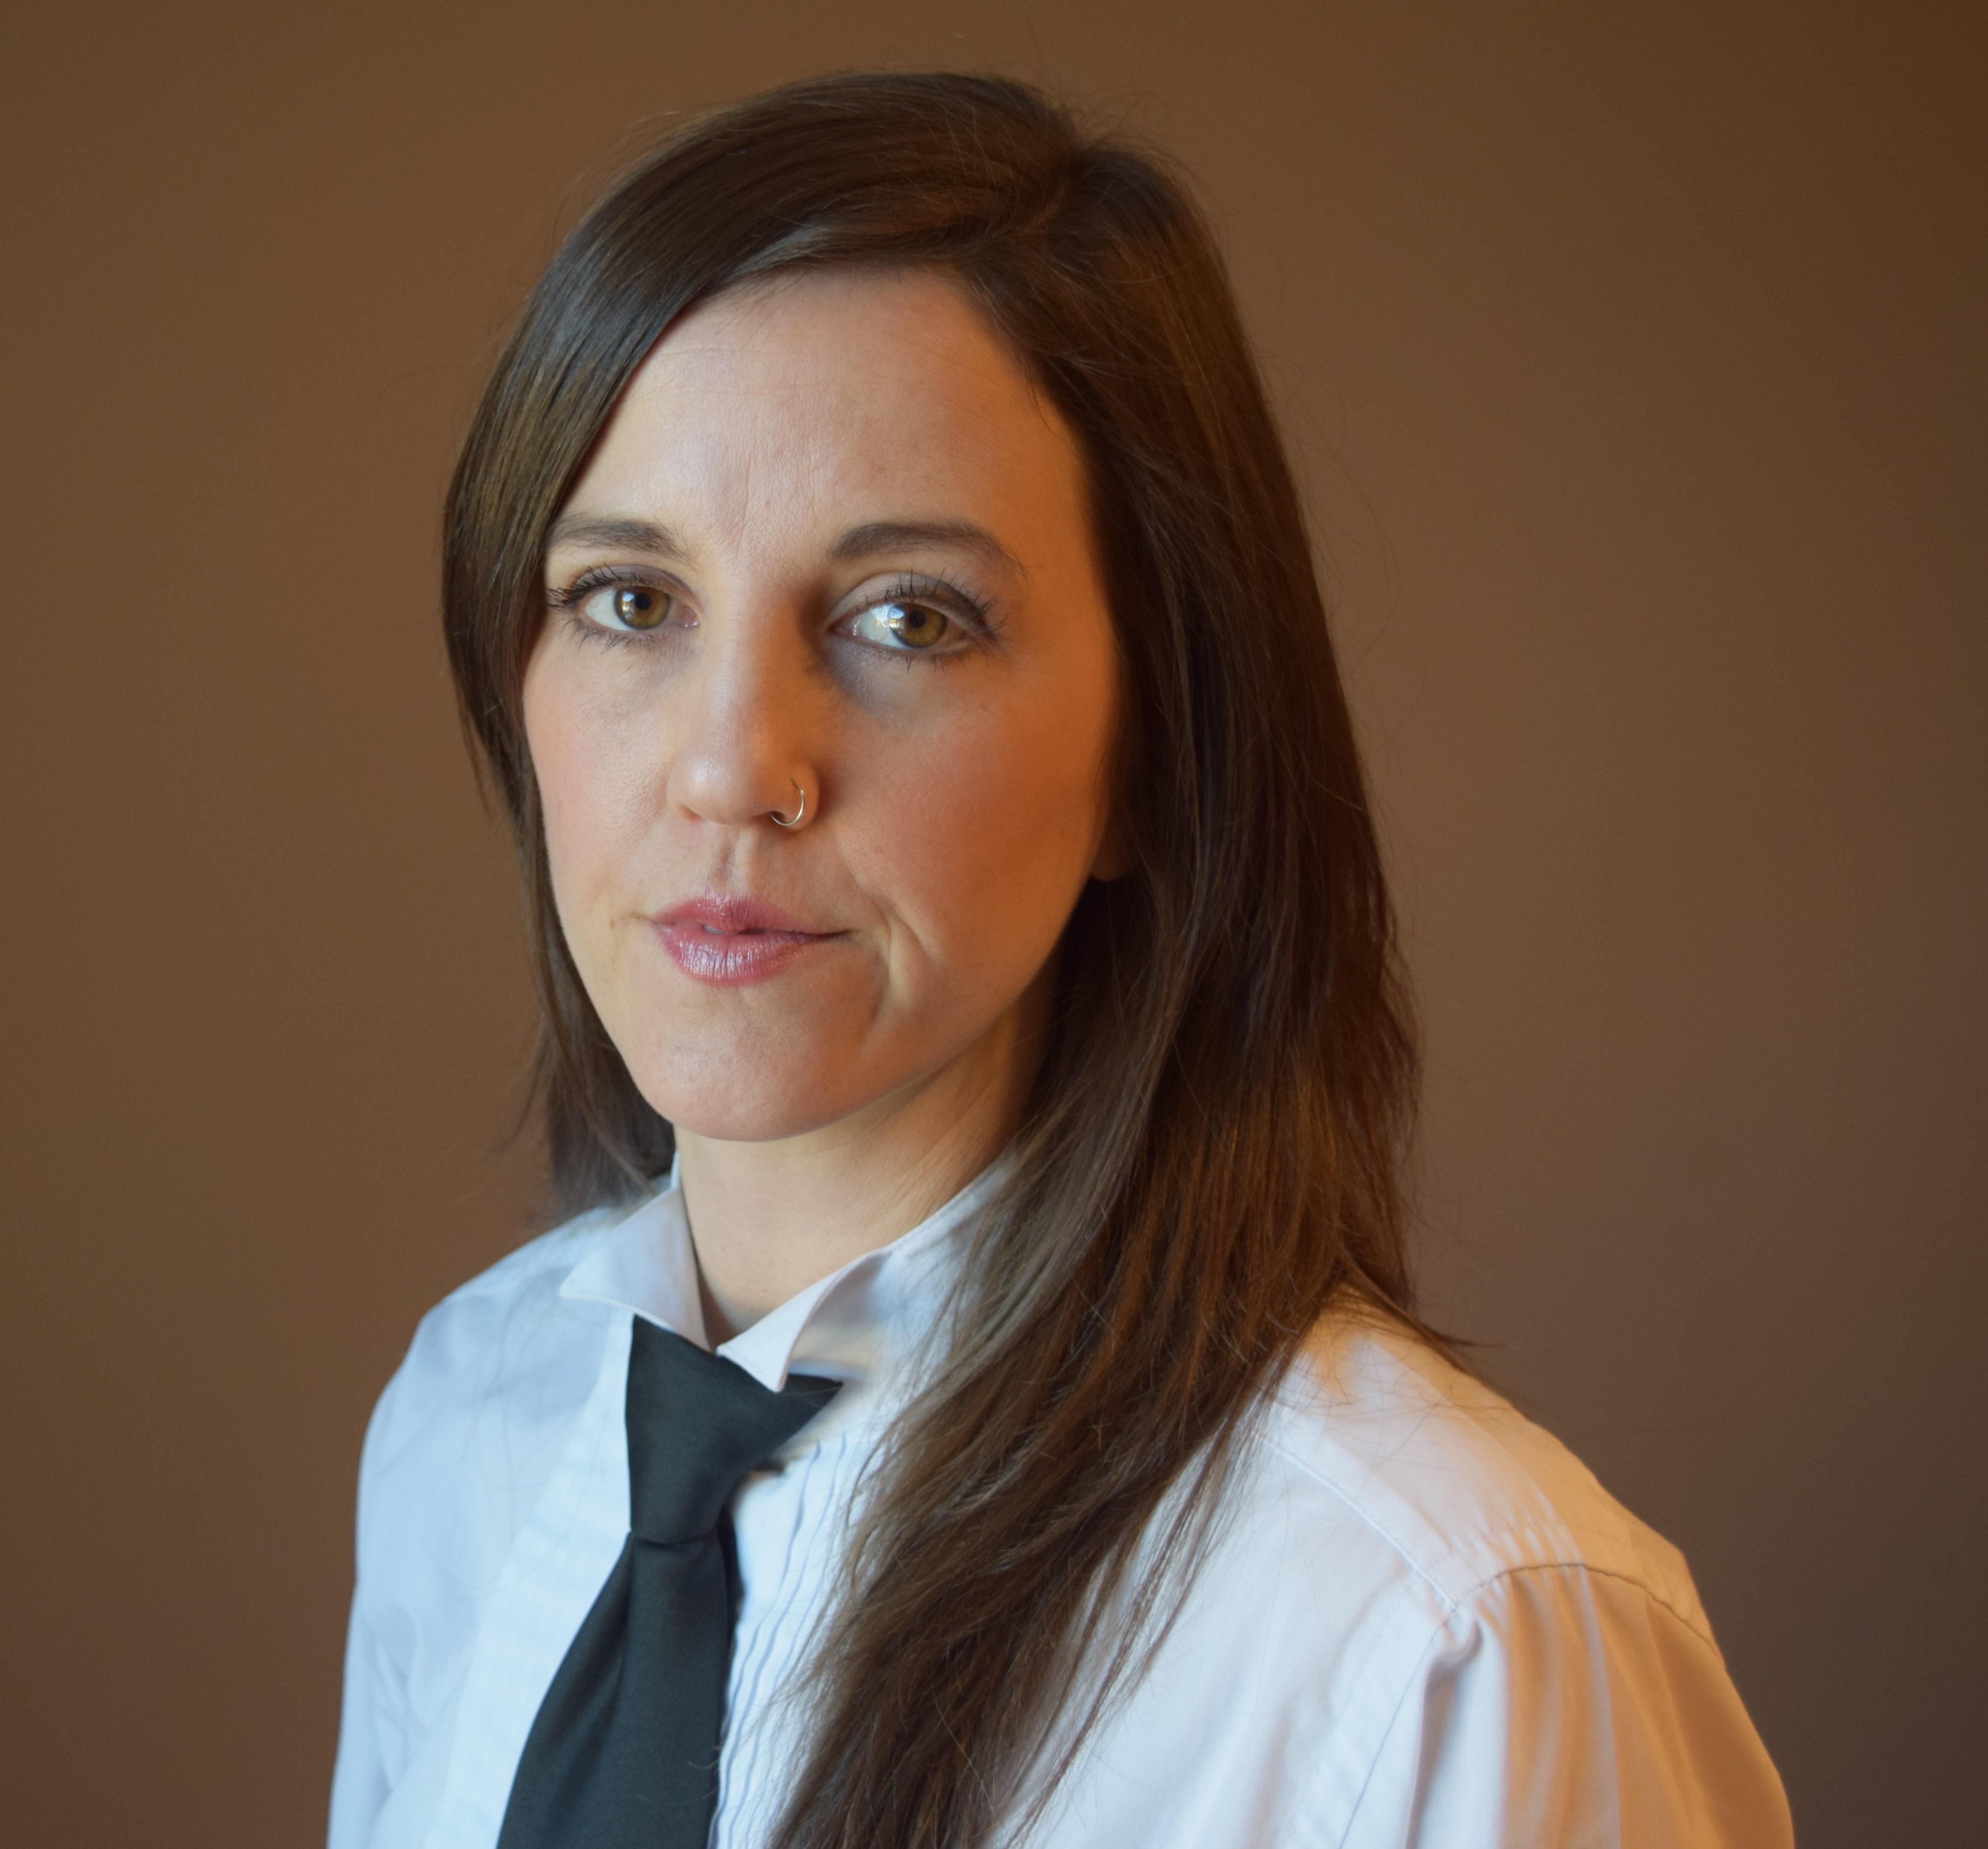 Associate Professor Stacy Douglas